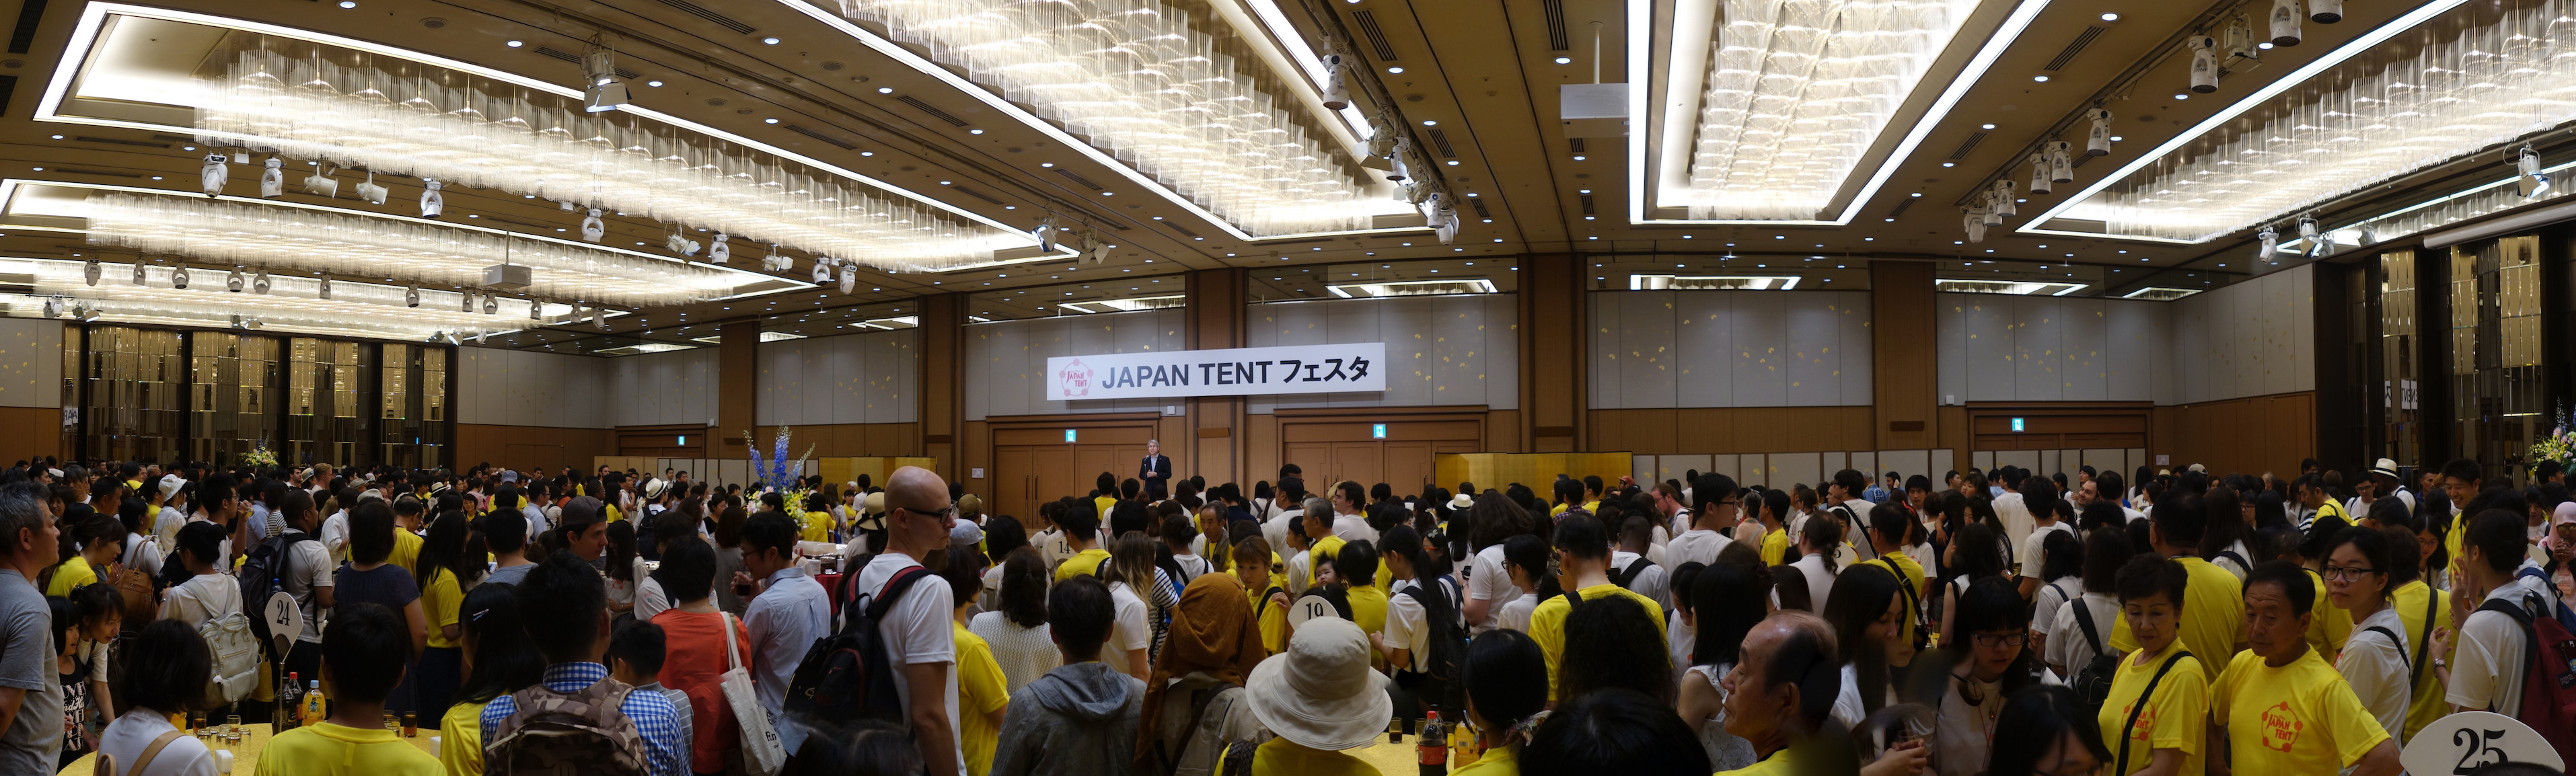 japantentfesta_small